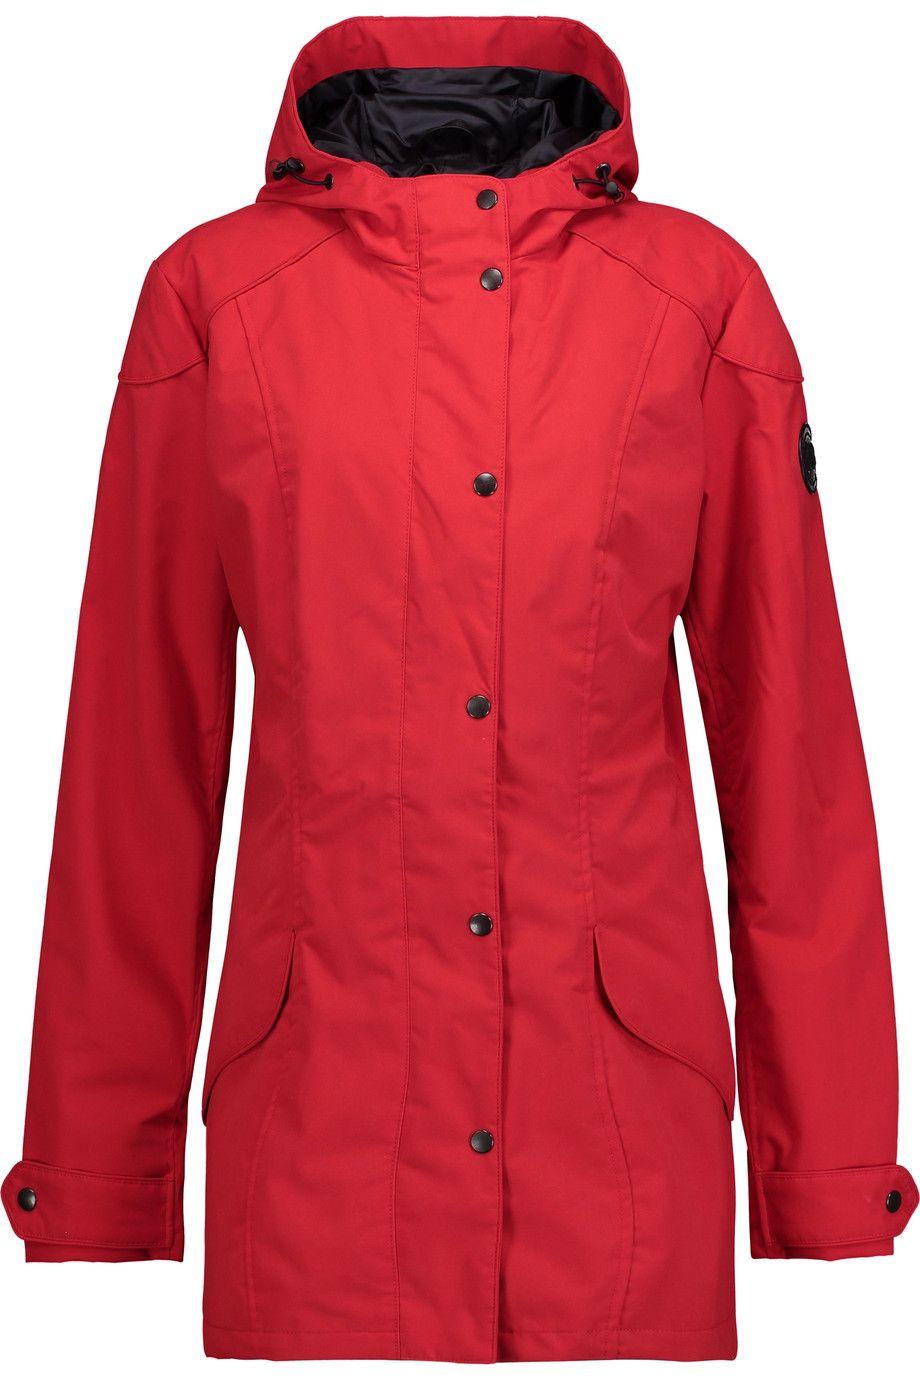 9879e2e94f Trends For Women S Fashion 2018. CANADA GOOSE Avondale Shell Jacket.  #canadagoose #cloth #jacket